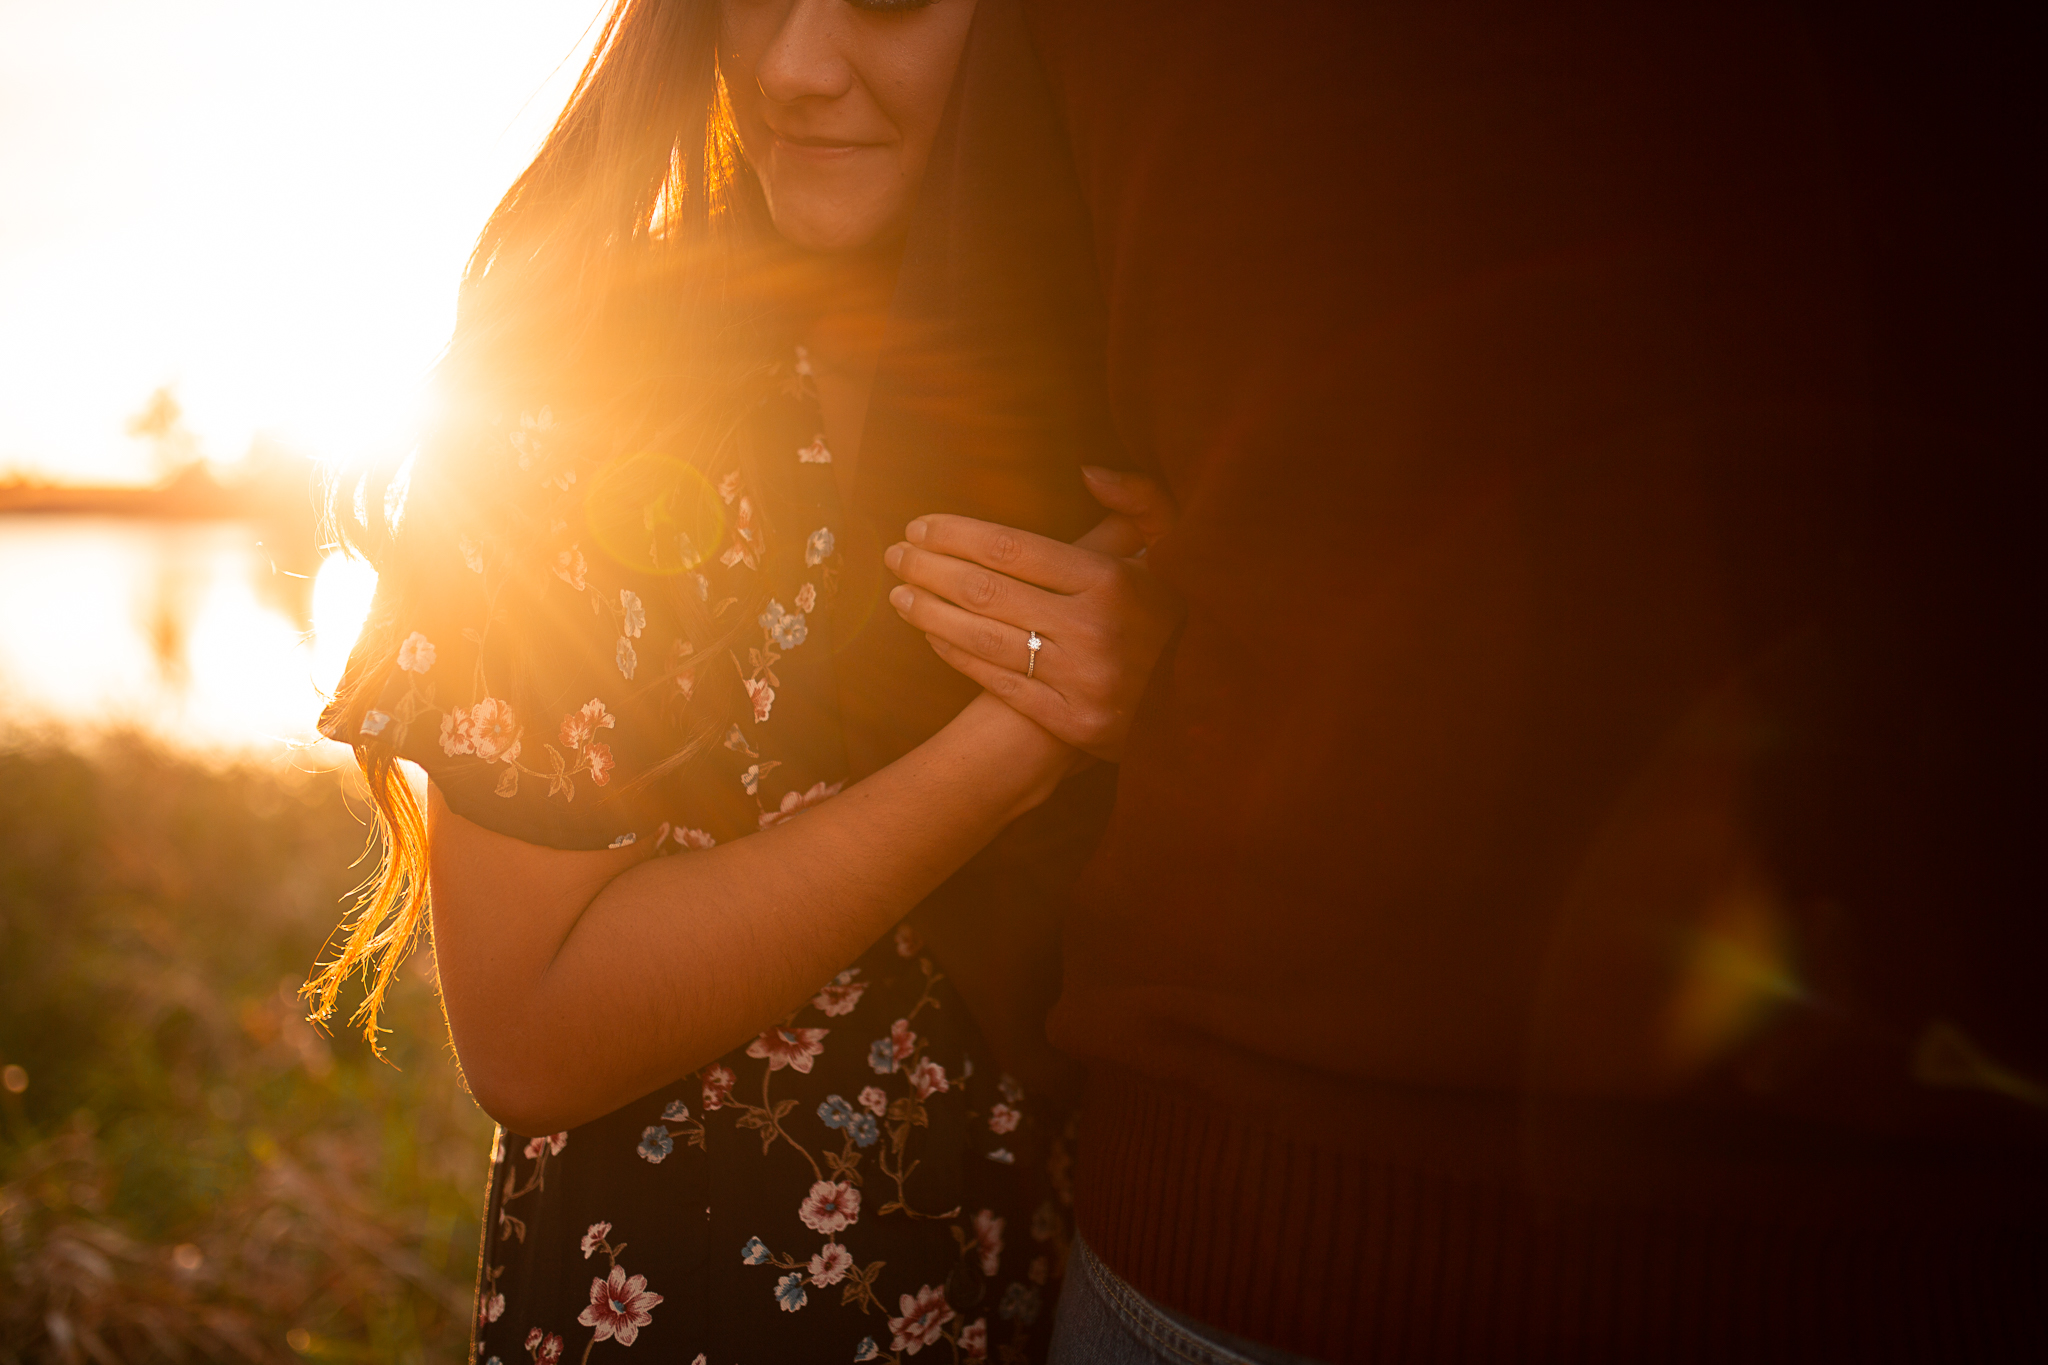 Fiance holding boyfriends arm at sunset